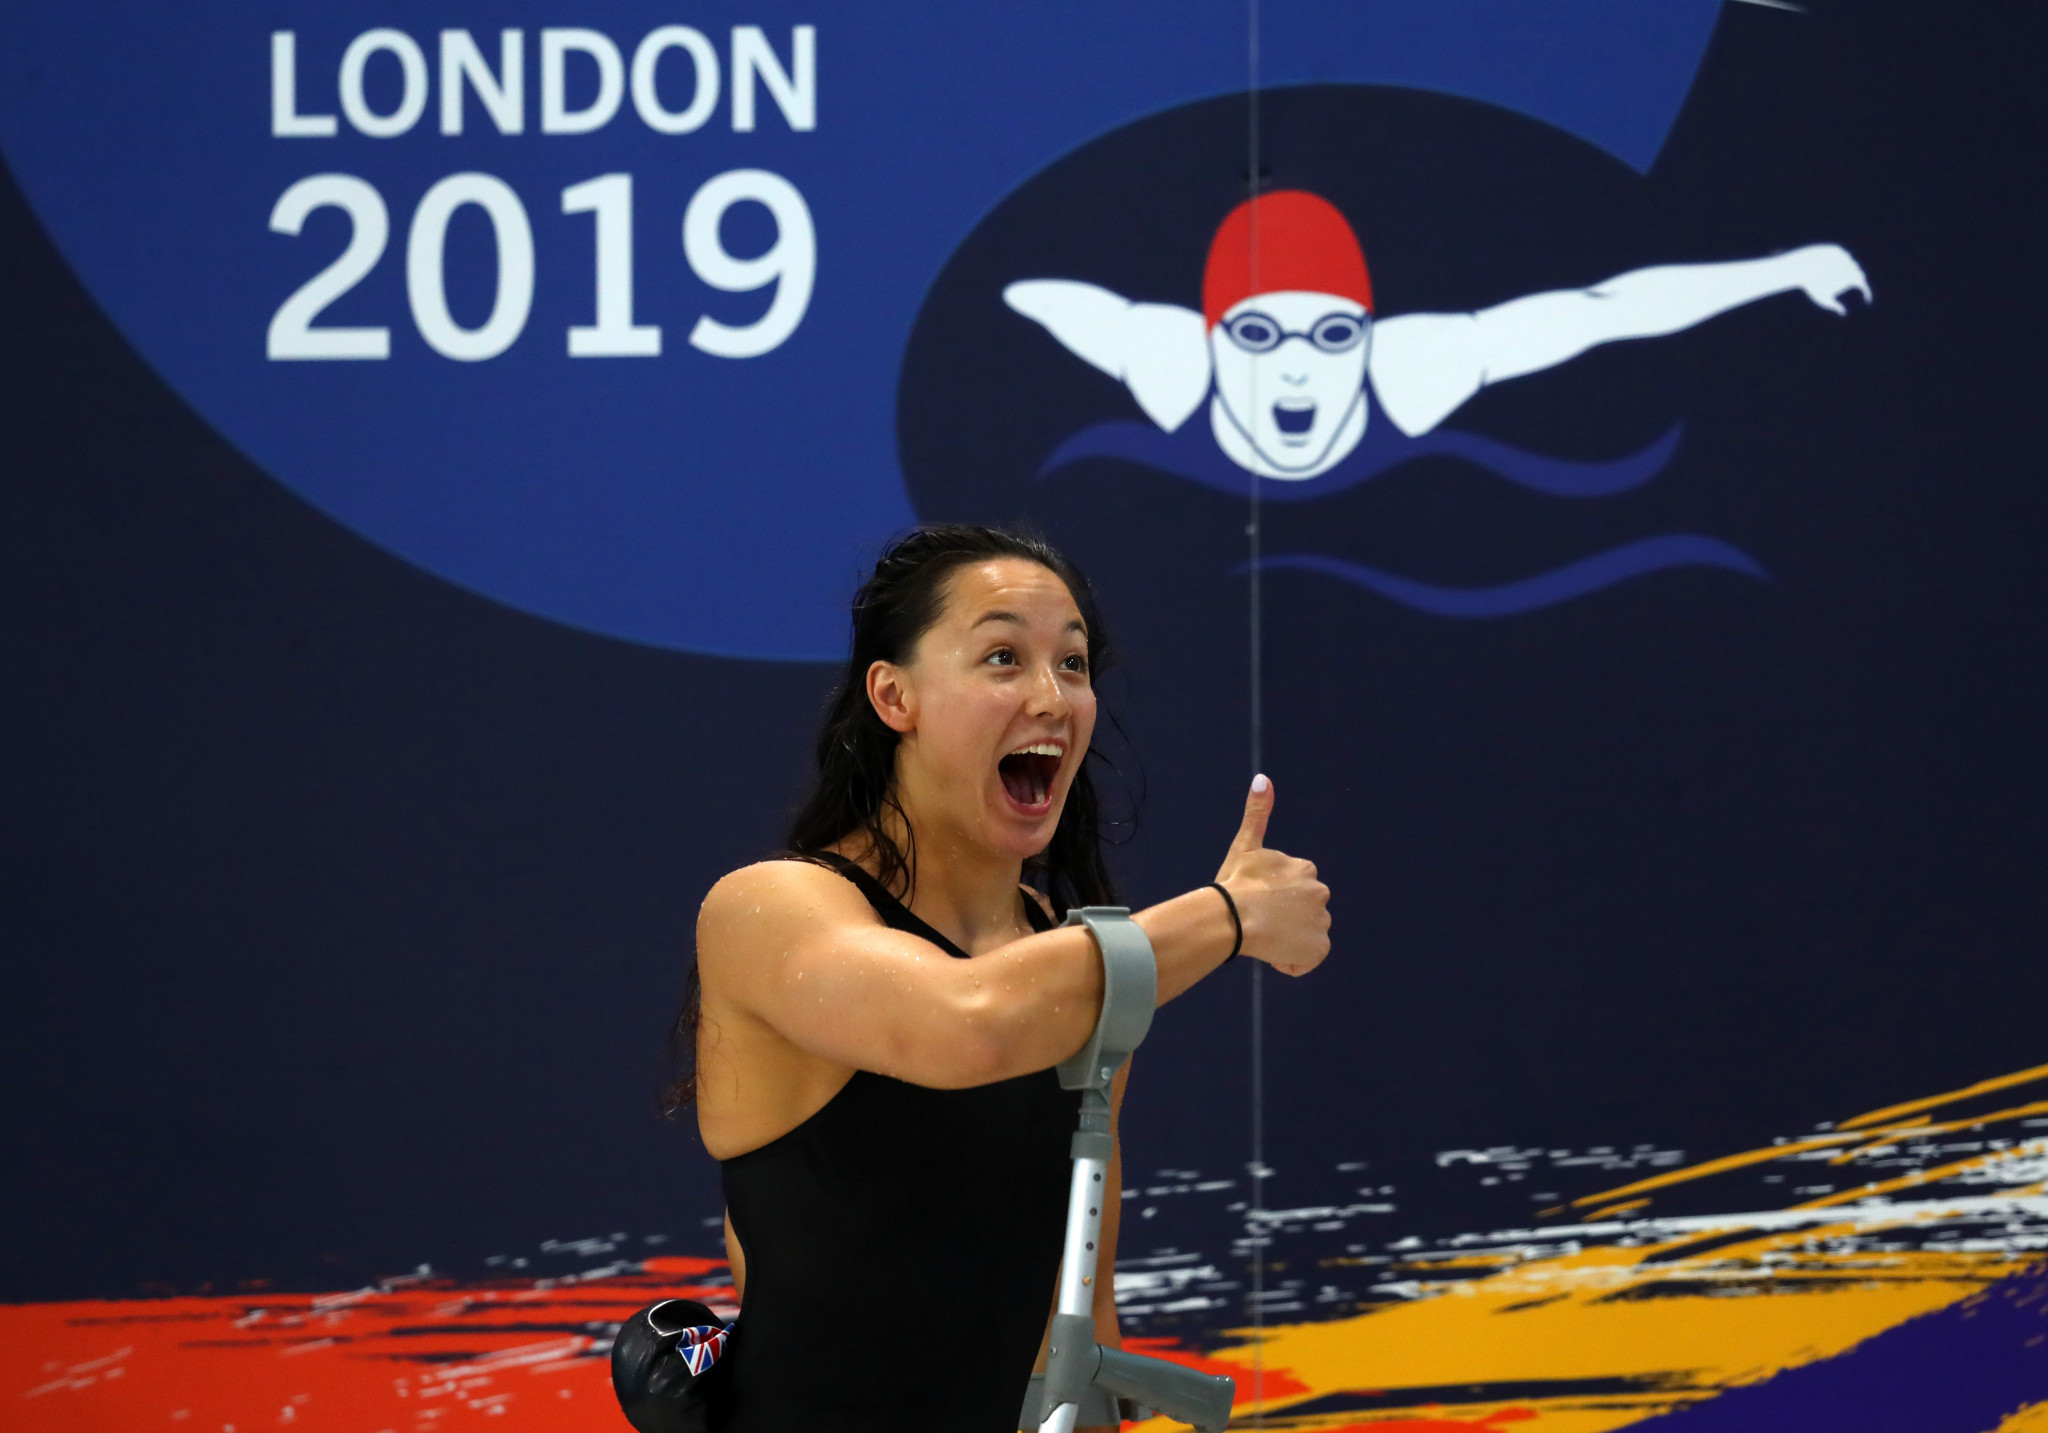 British swimmer Tai wins IPC Allianz Athlete of the Month award